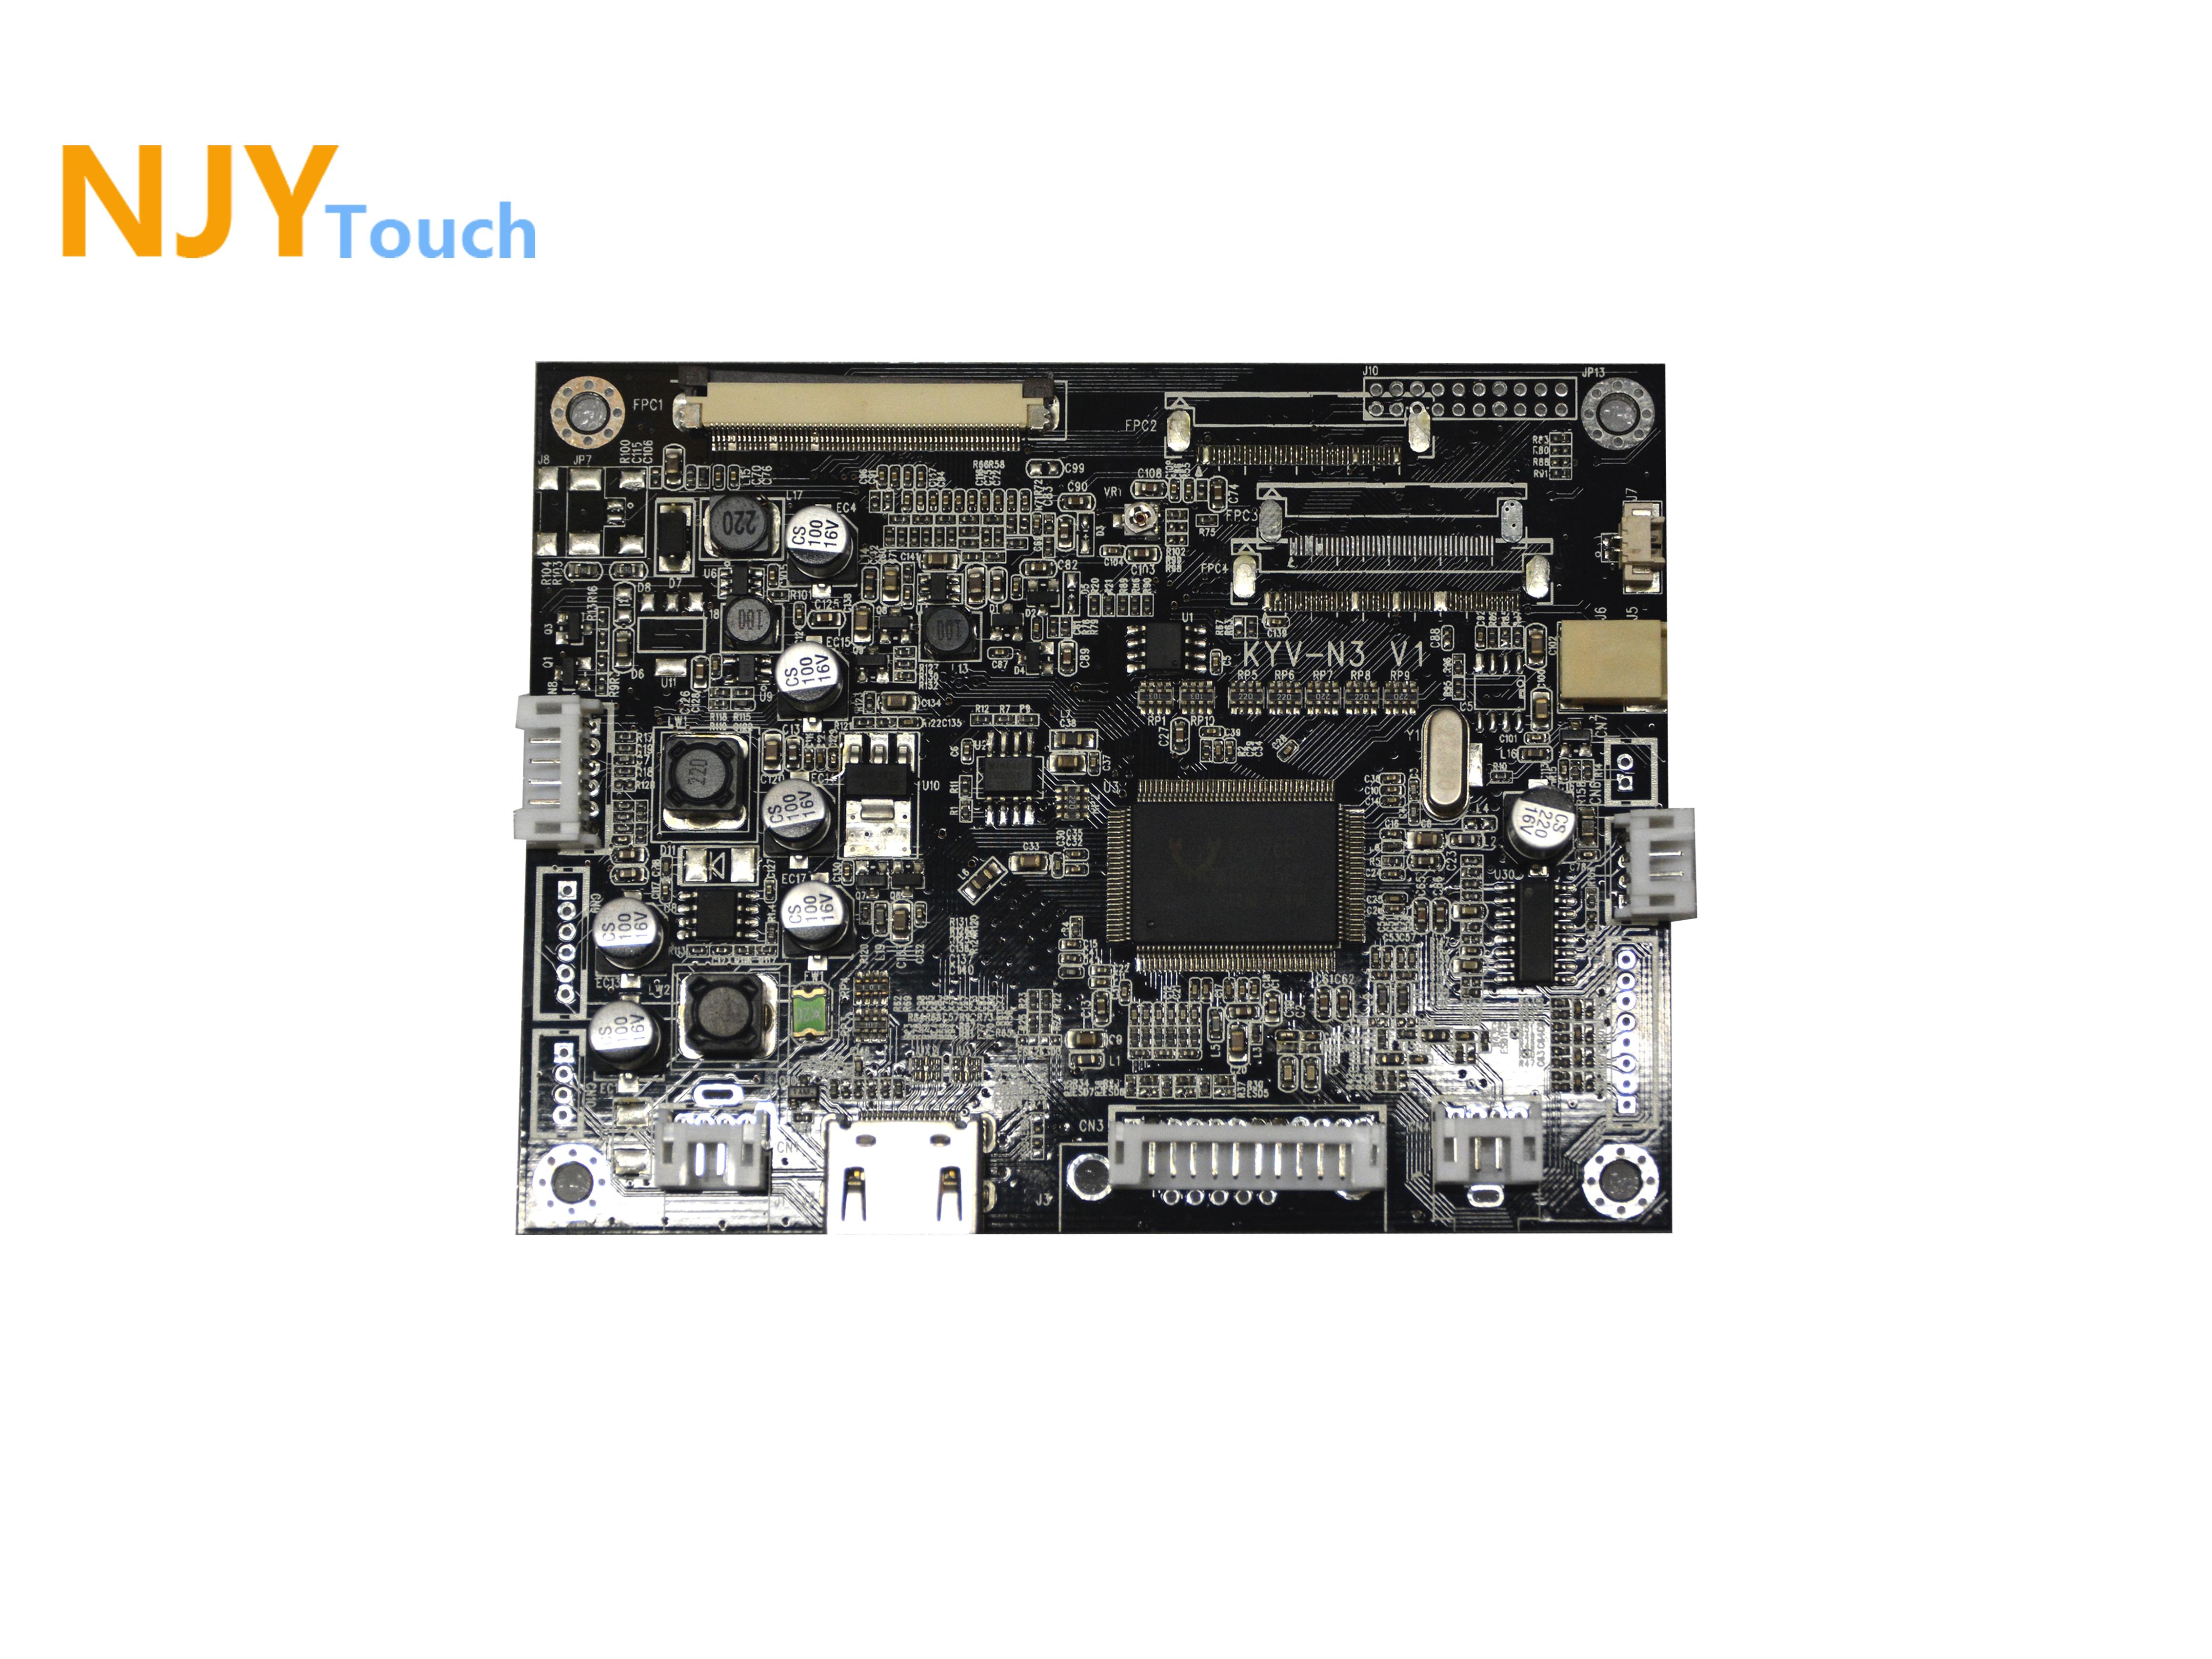 NJYTouch KYV-N3 V1 HDMI VGA AV LCD Controller Board For 10.4inch A104SN03 V1 800x600 LCD Screen